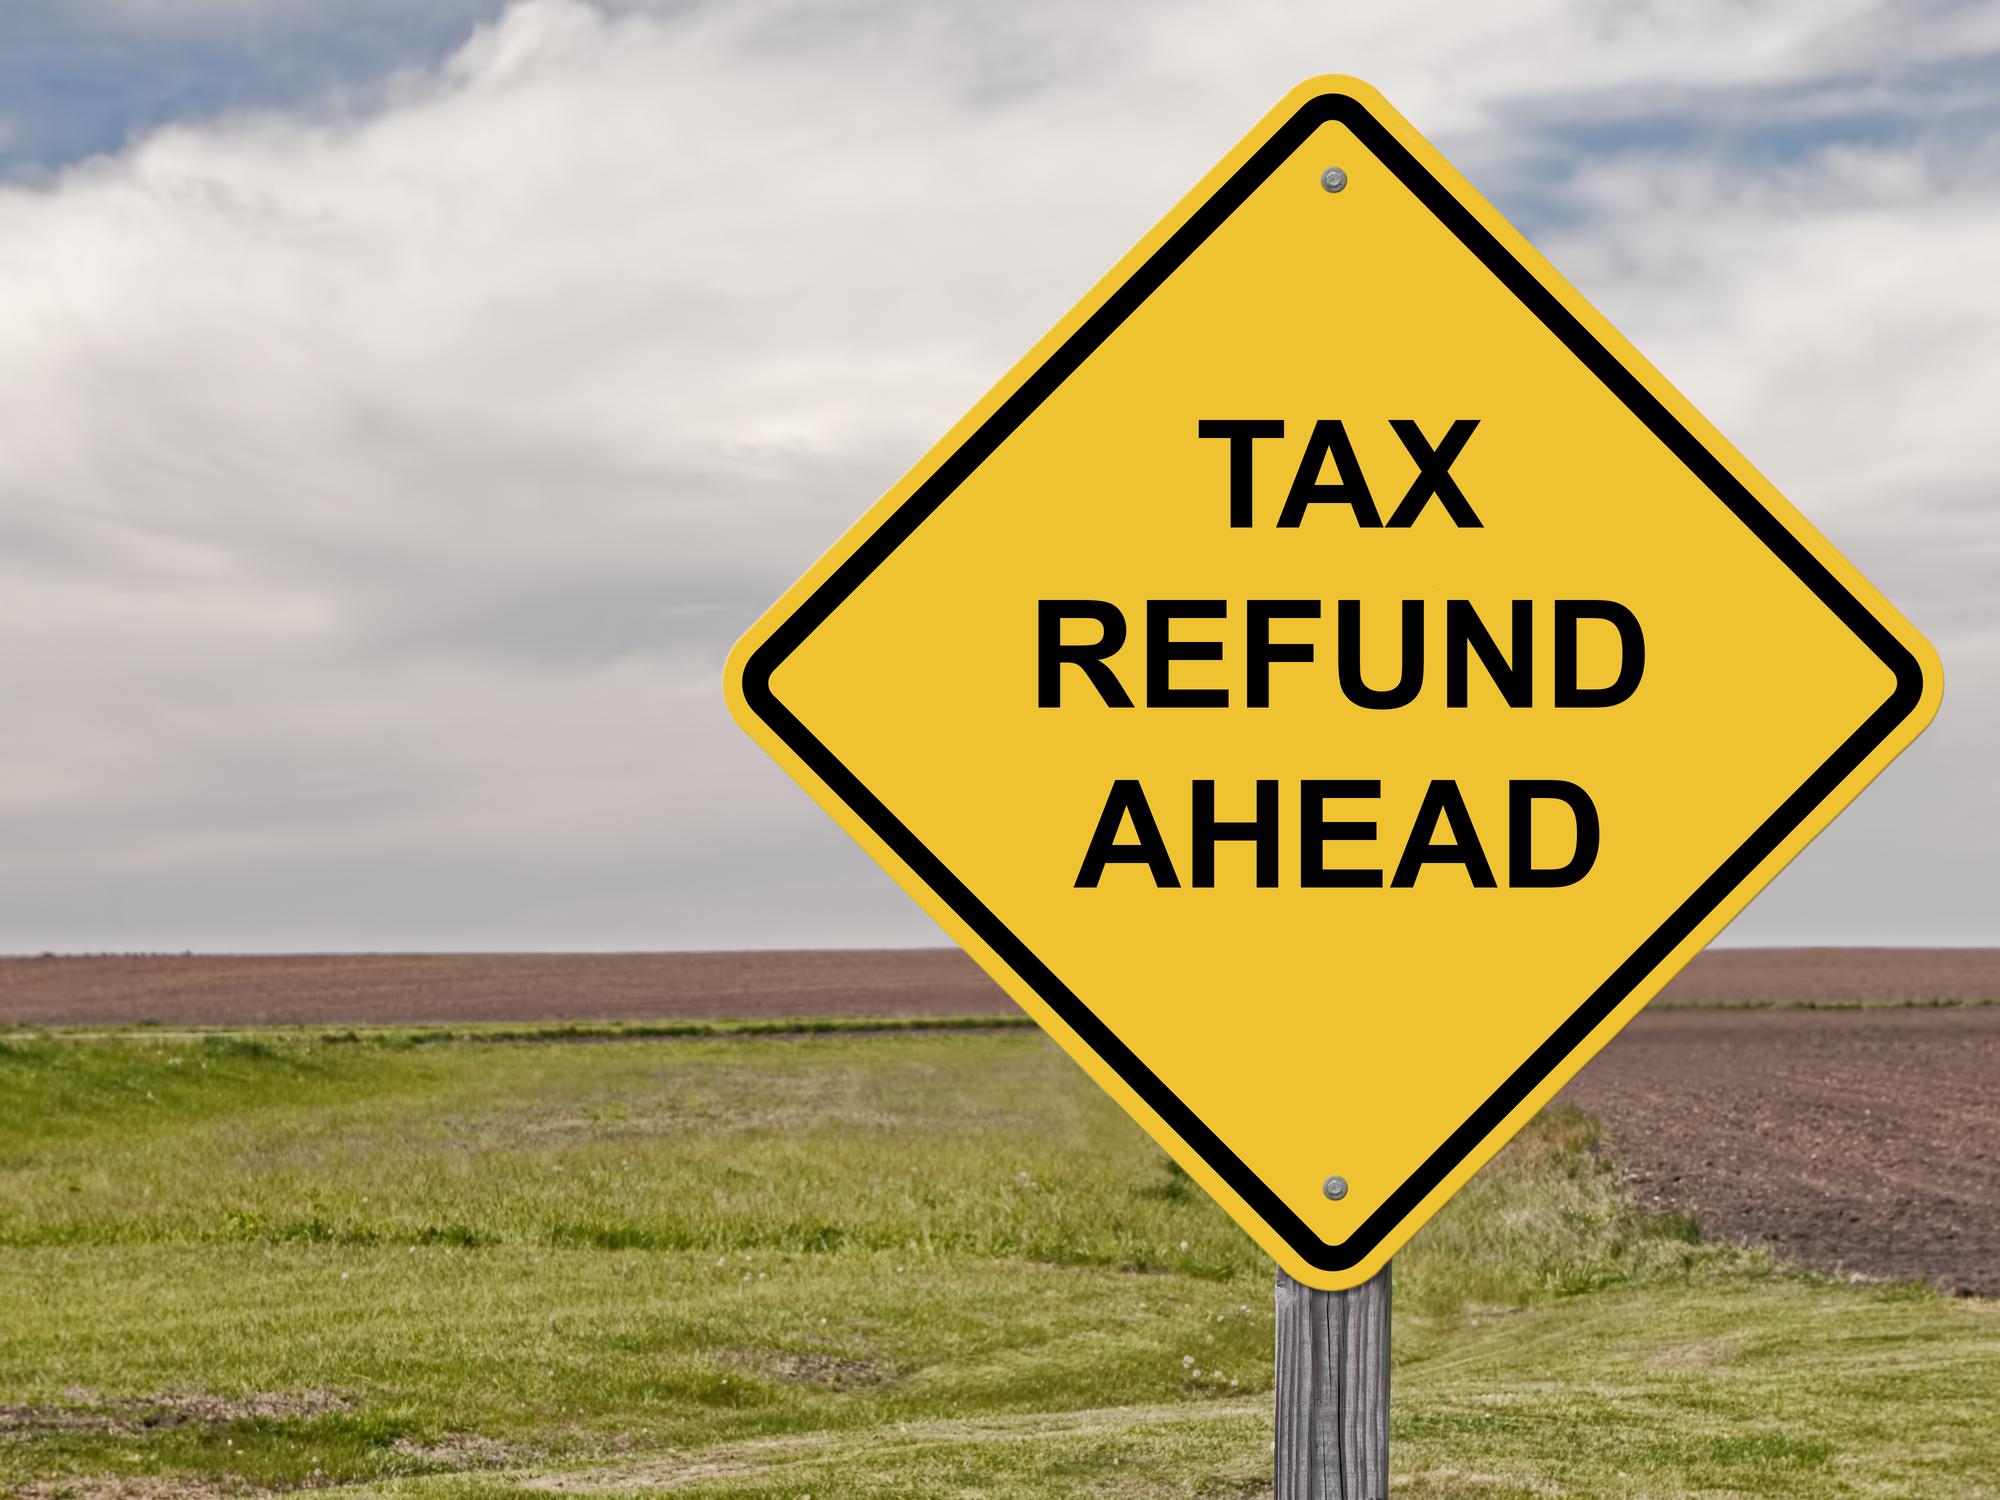 Tax Refund Ahead diamond-shaped road sign